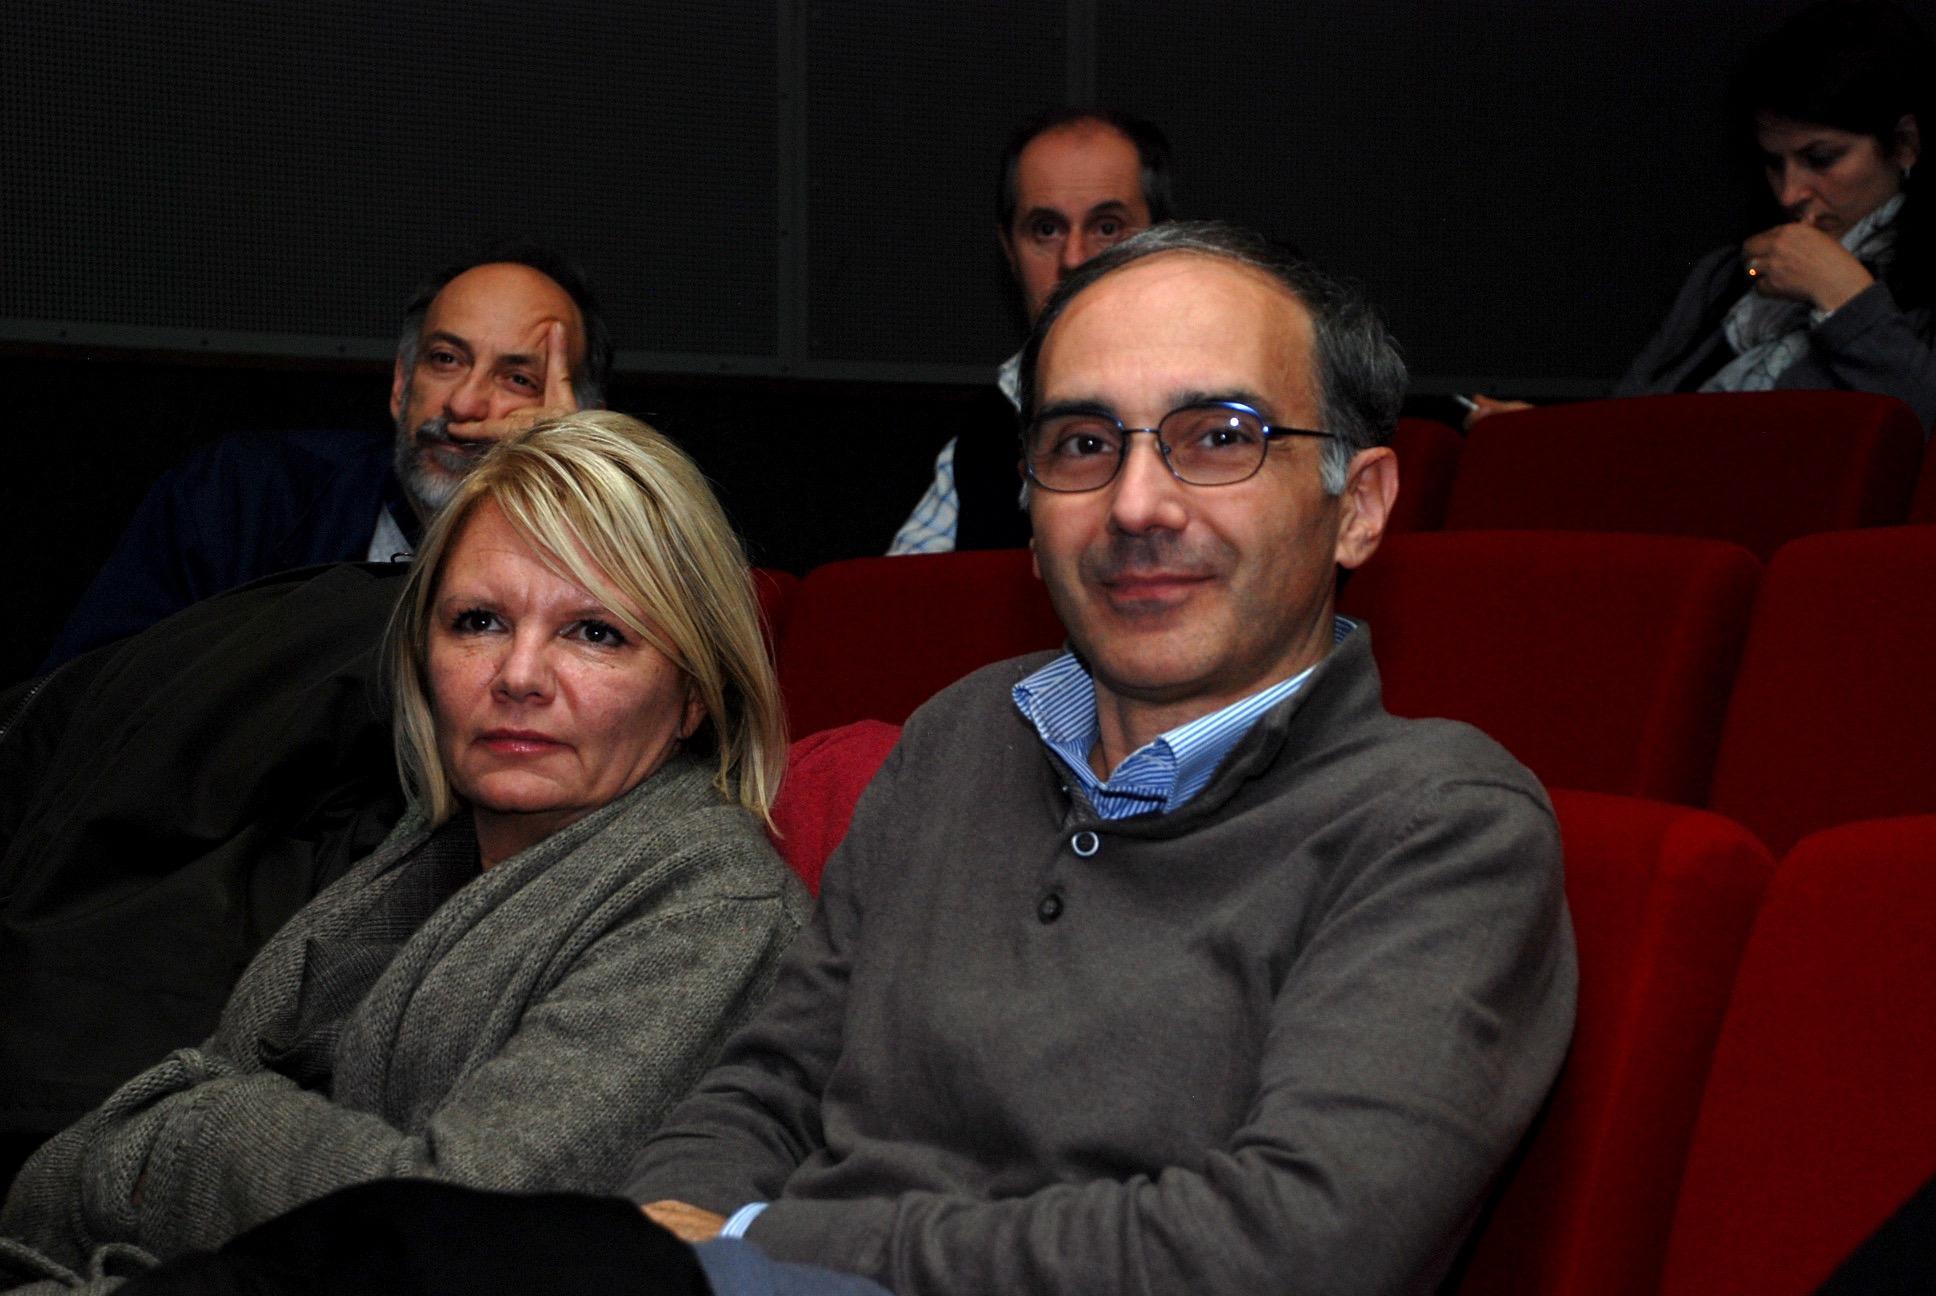 L'ingegnere Gianluigi Masino nuovo dirigente dell'Igiene Urbana dell'Asp